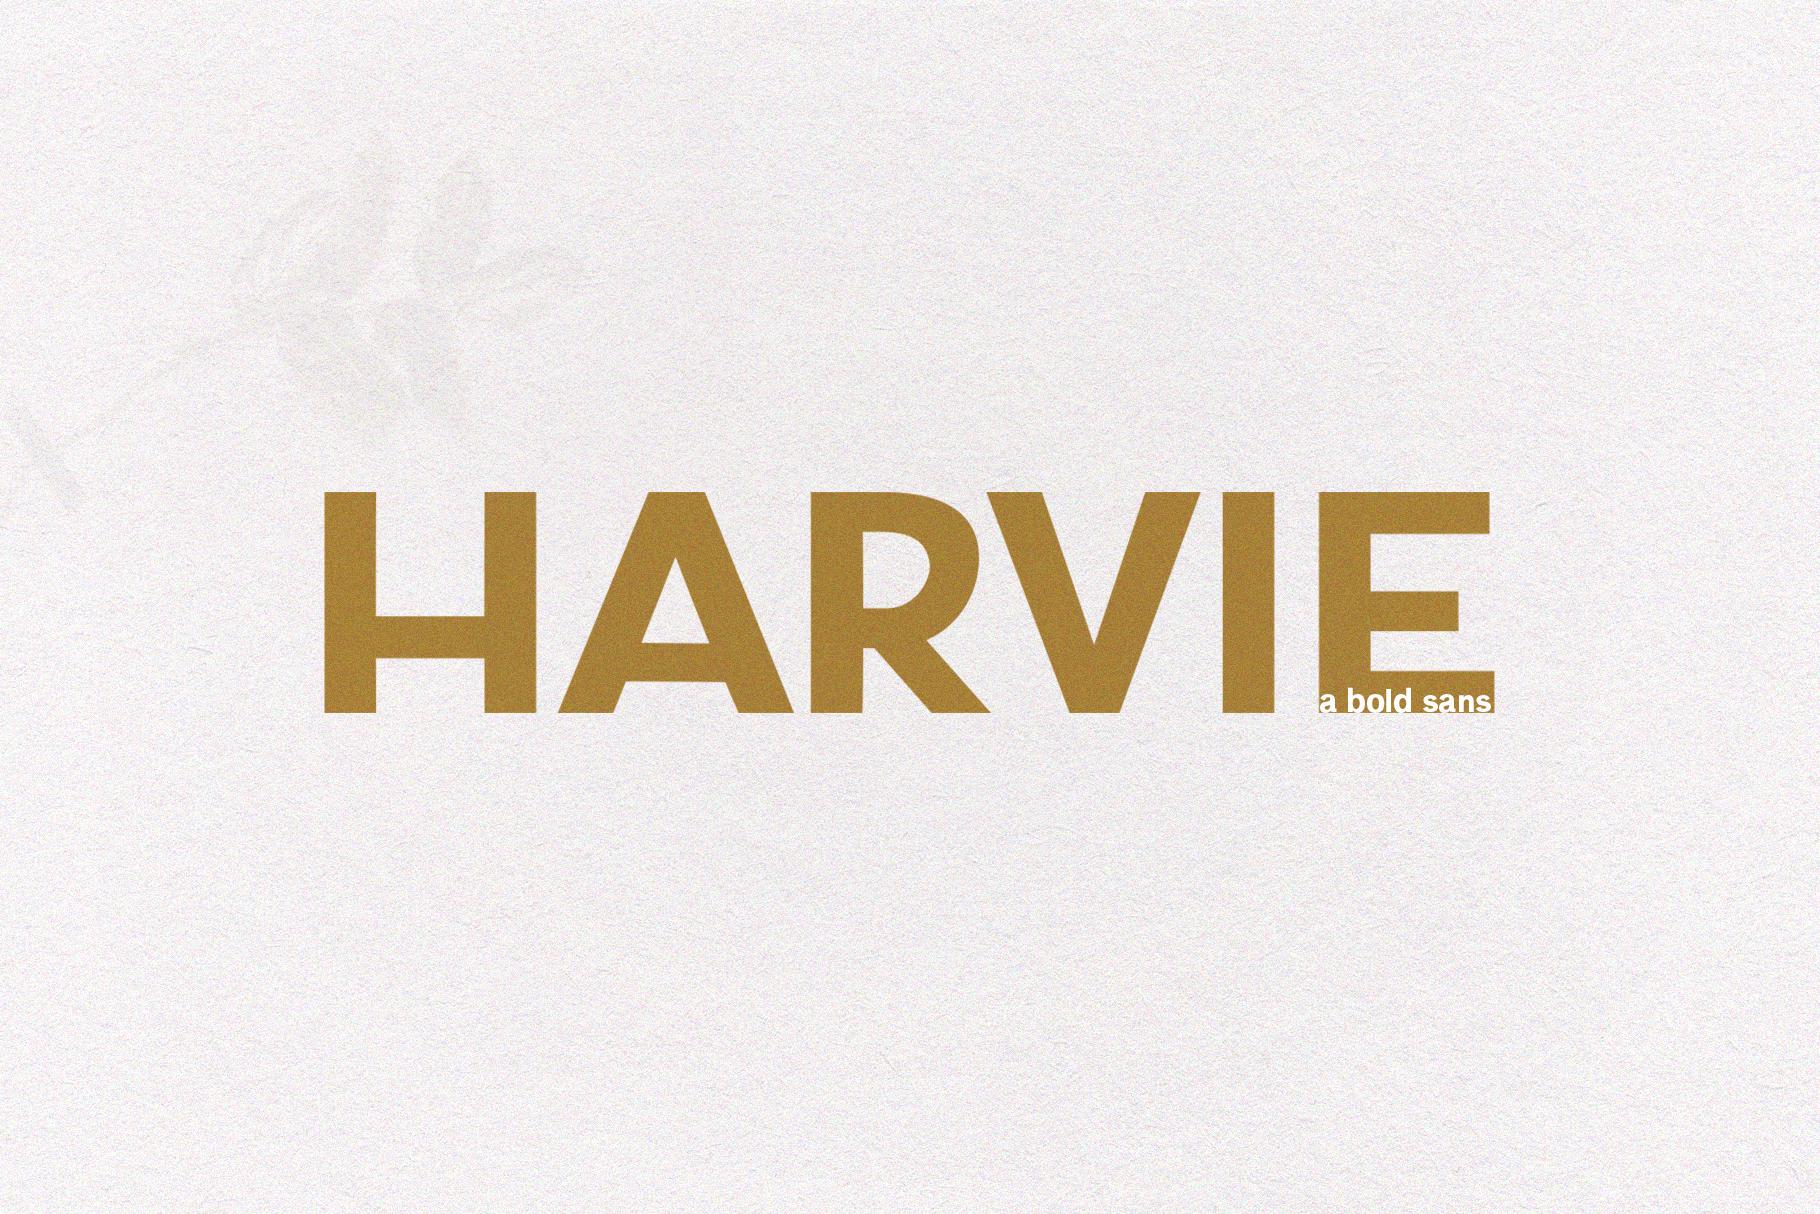 Harvie - A Bold Sans Font example image 1